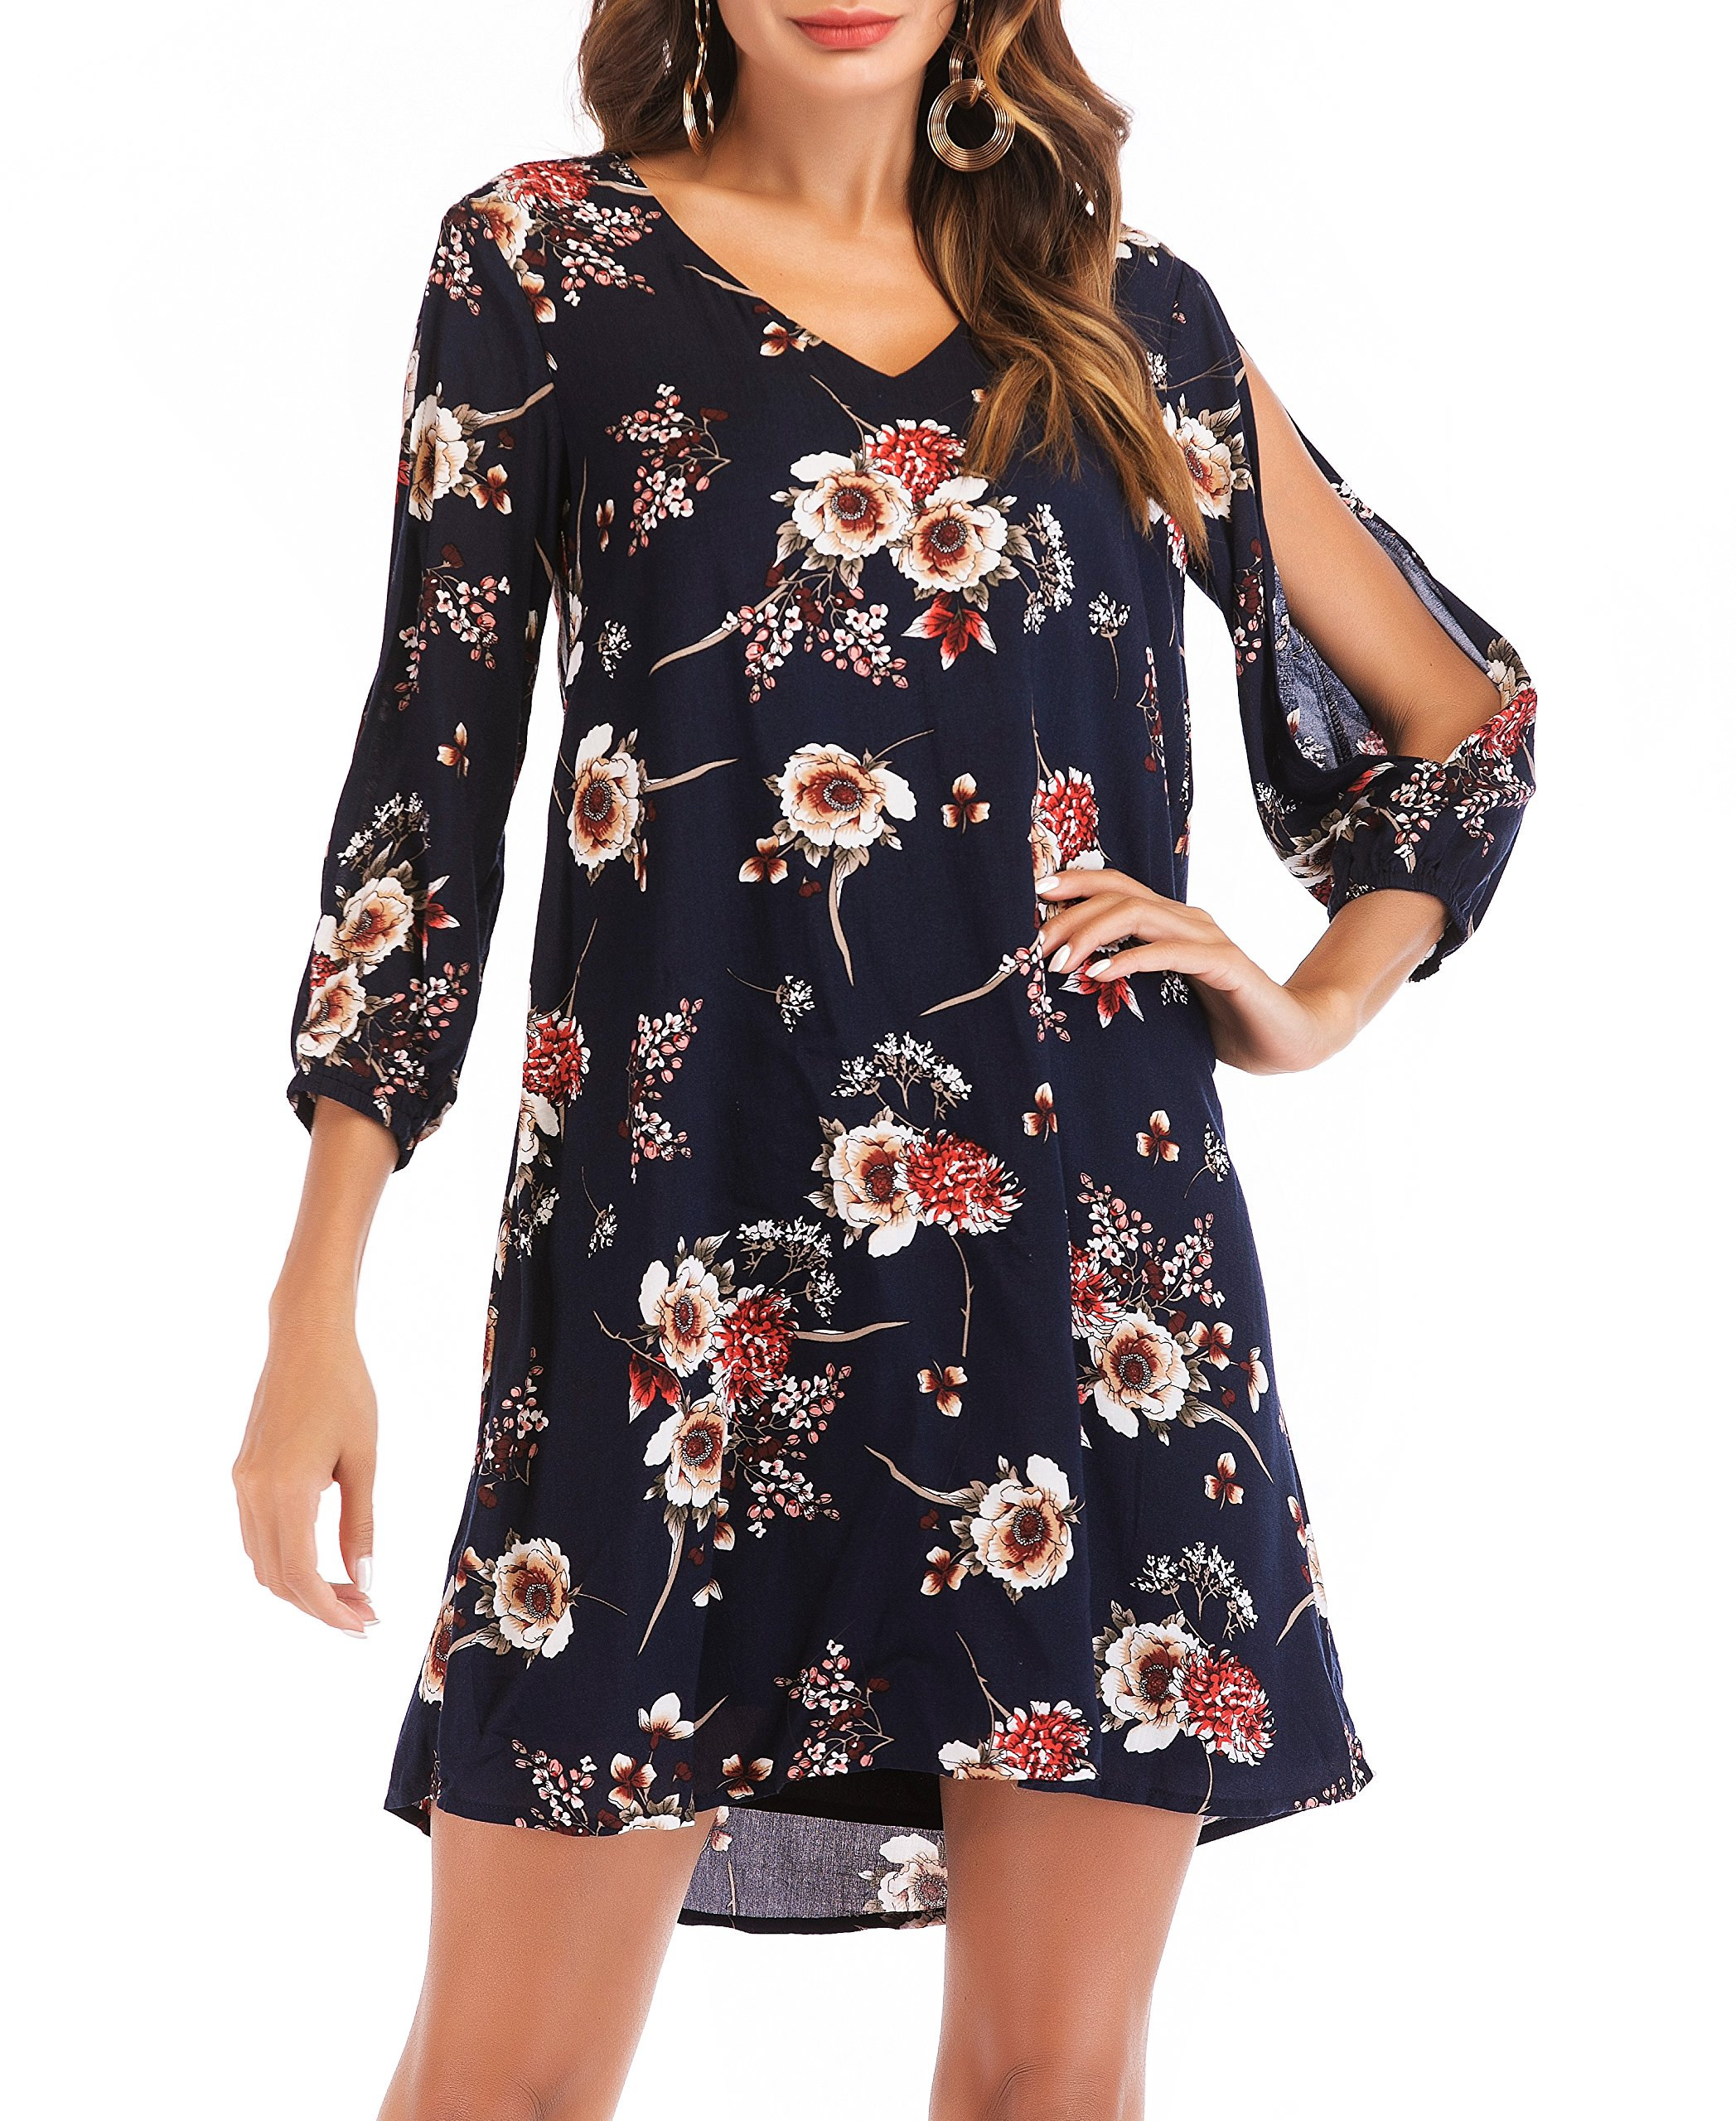 NALATI SUNNOW Women's V Neck Cold Shoulder Floral Print Long Open Sleeves Casual Shift Dress (XL(US16-18), Navy Blue)